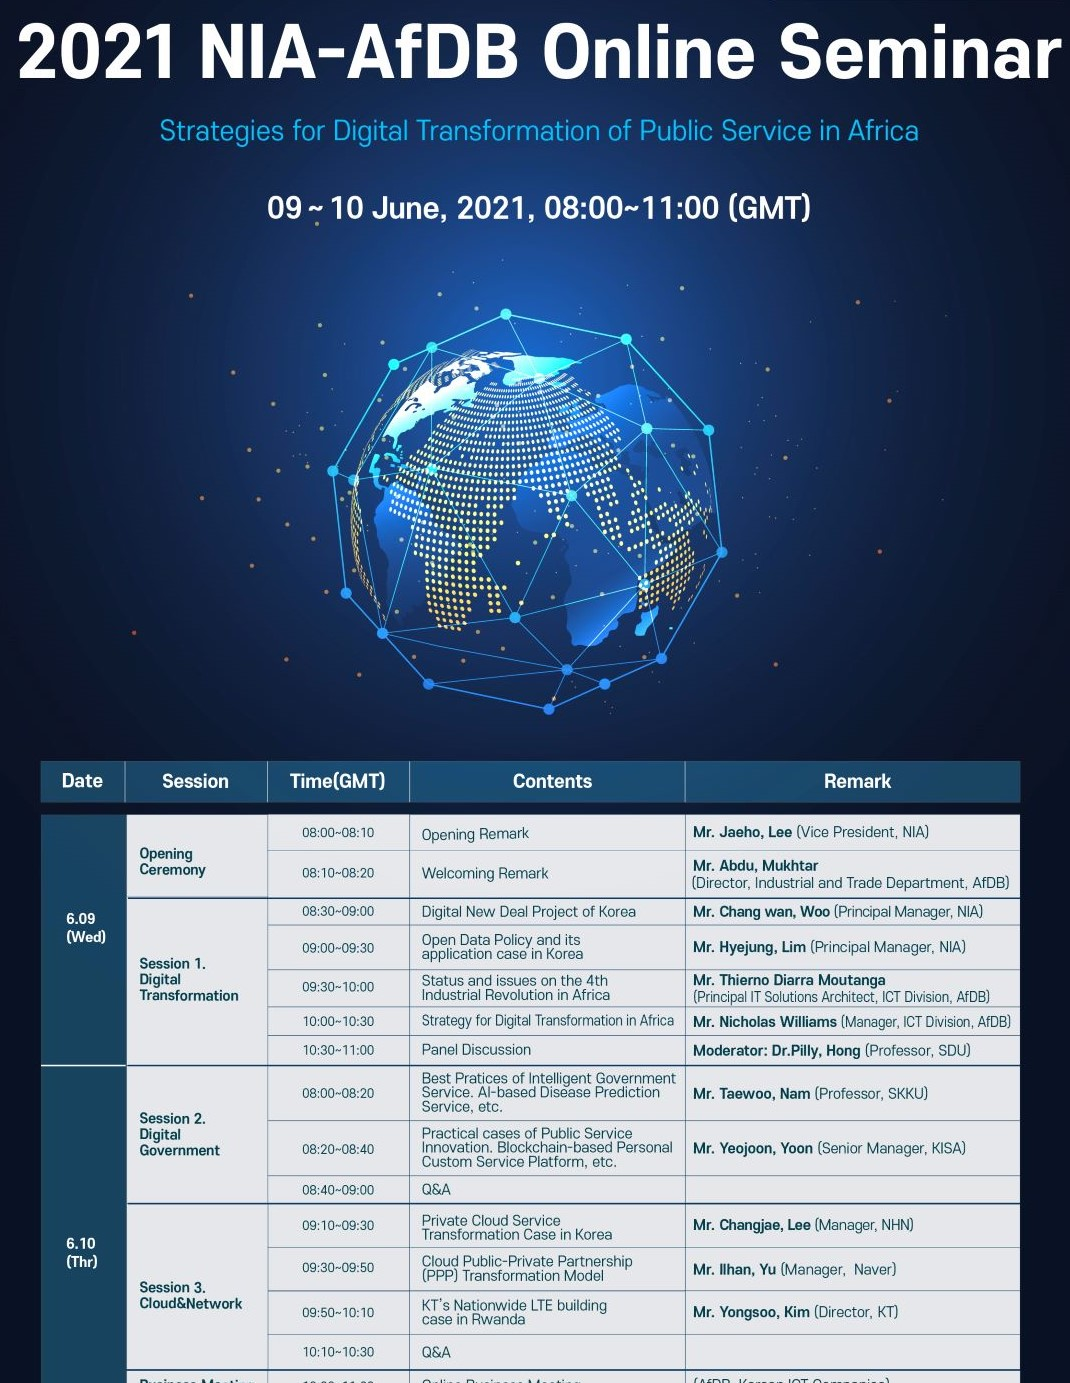 NIA-AfDB ICT Online Seminar : Strategies for Digital Transformation of Public Services